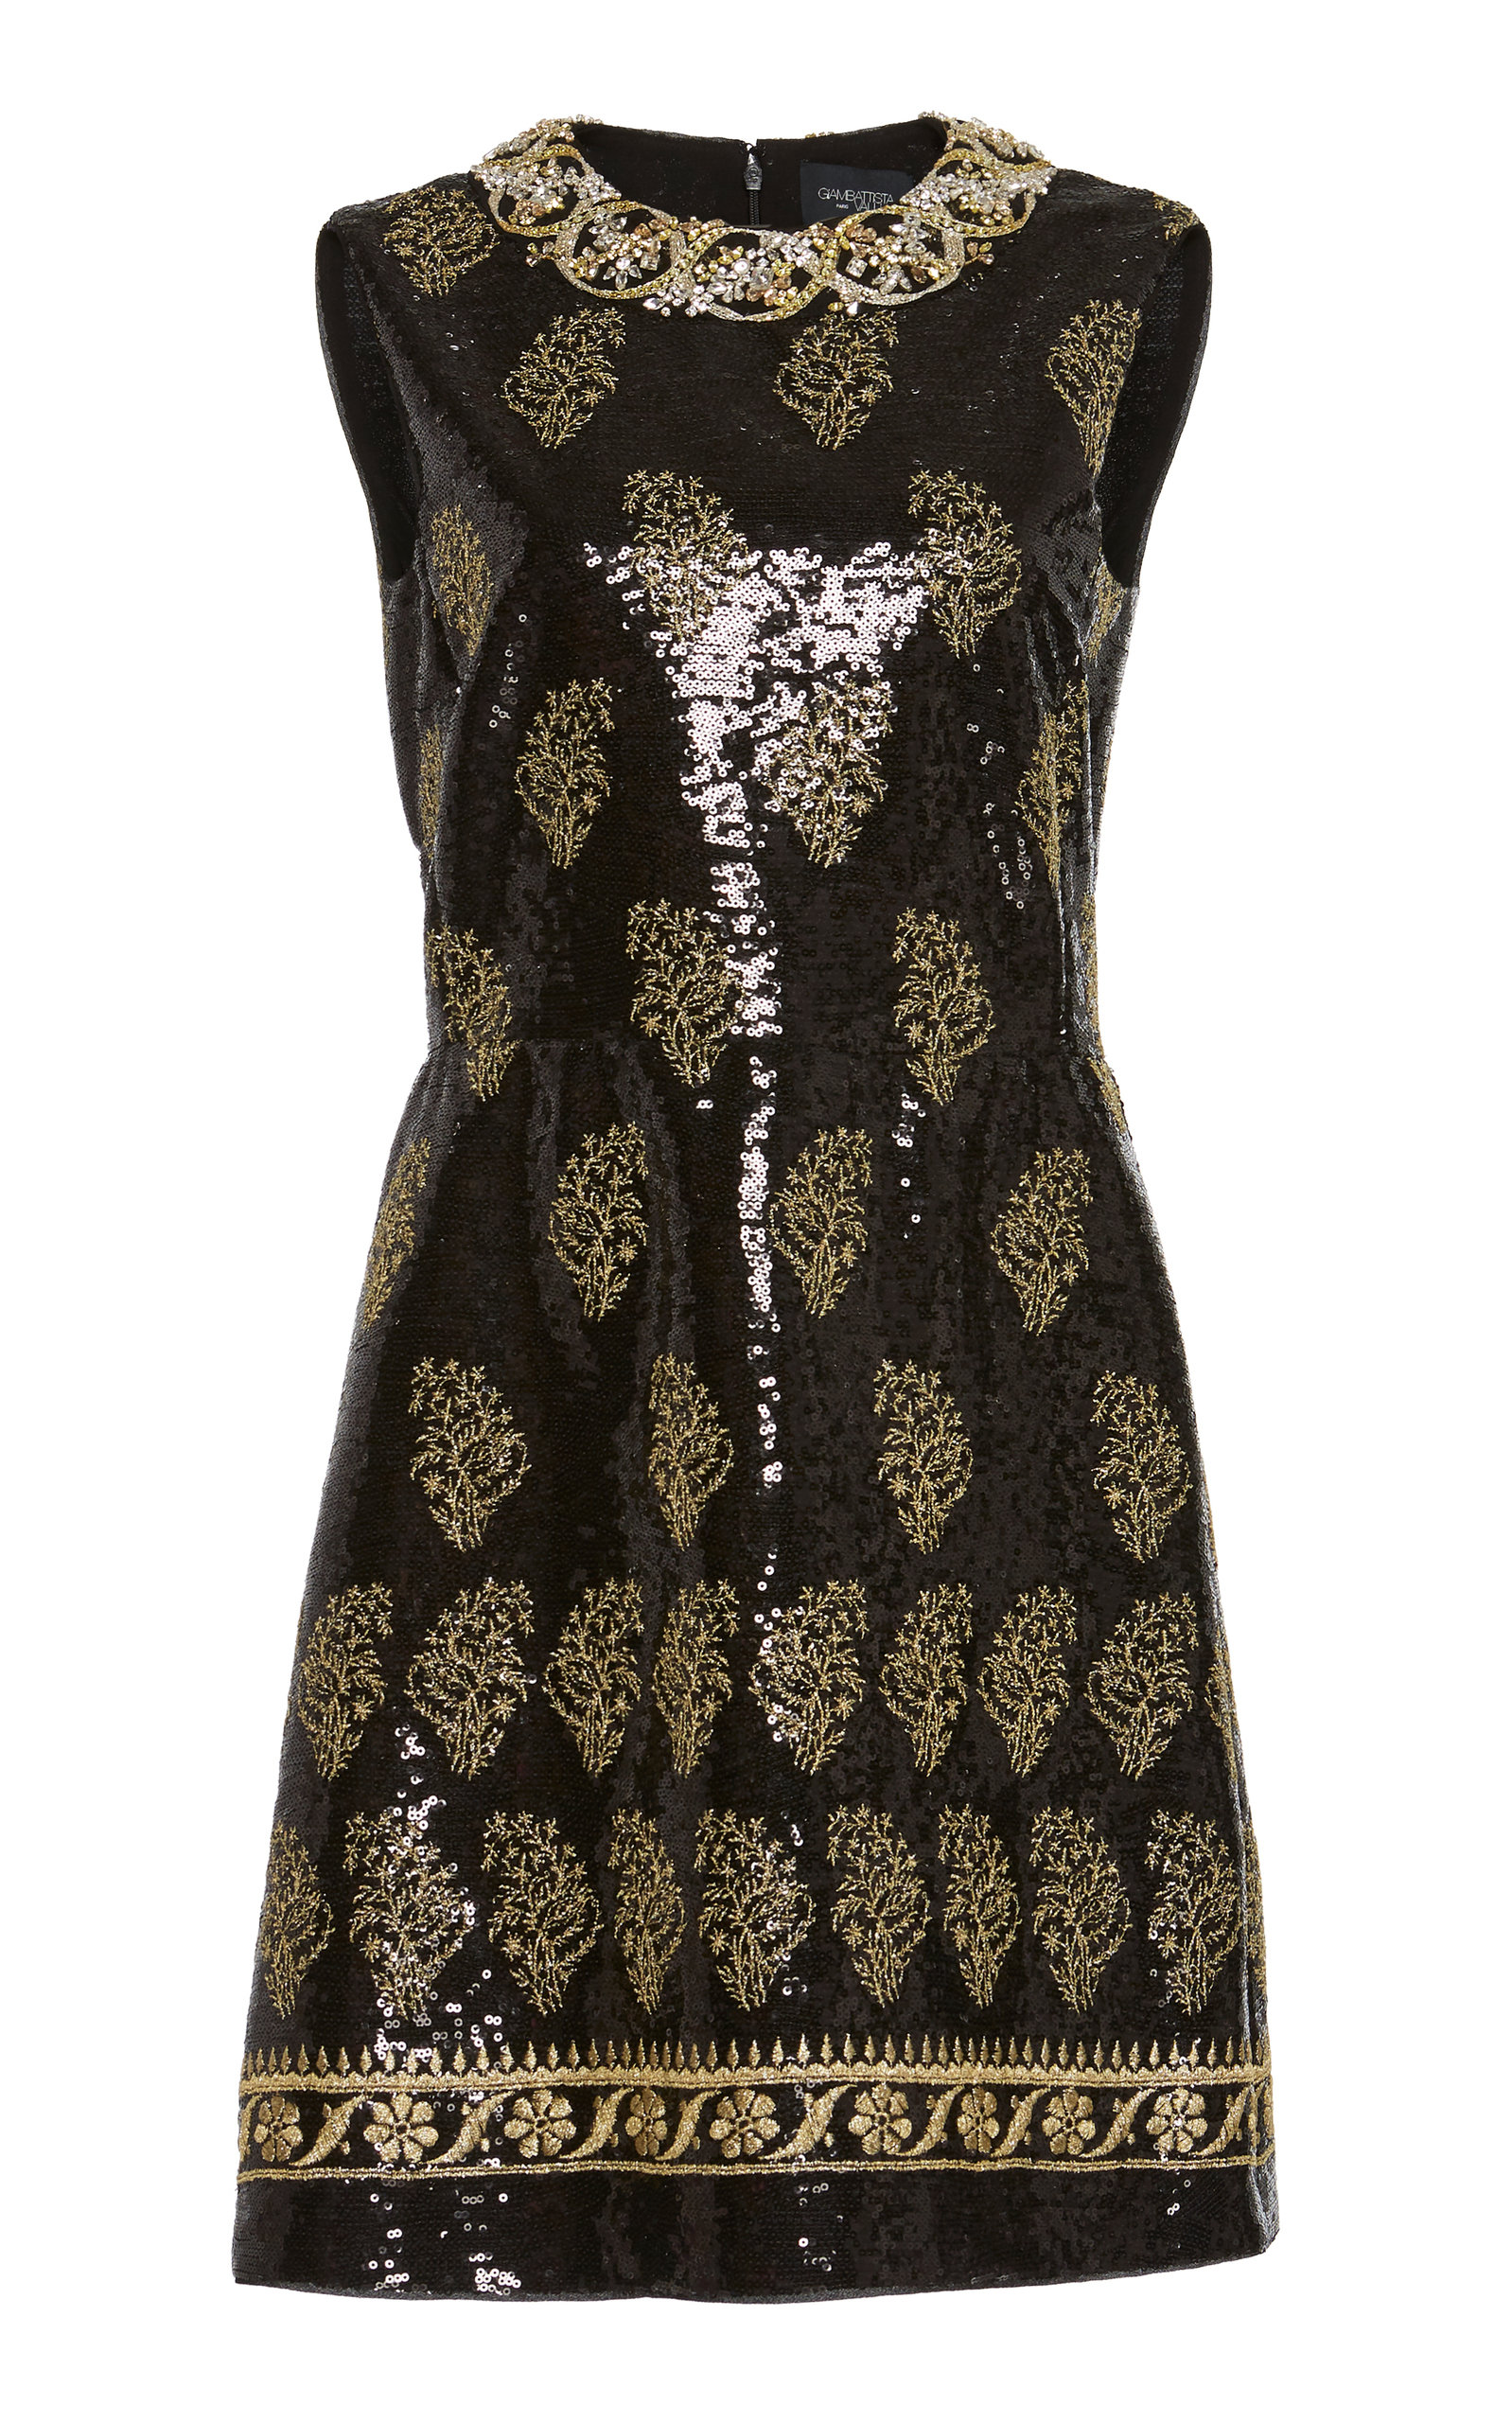 Buy Giambattista Valli Embroidered Sequined Mini Dress online, shop Giambattista Valli at the best price